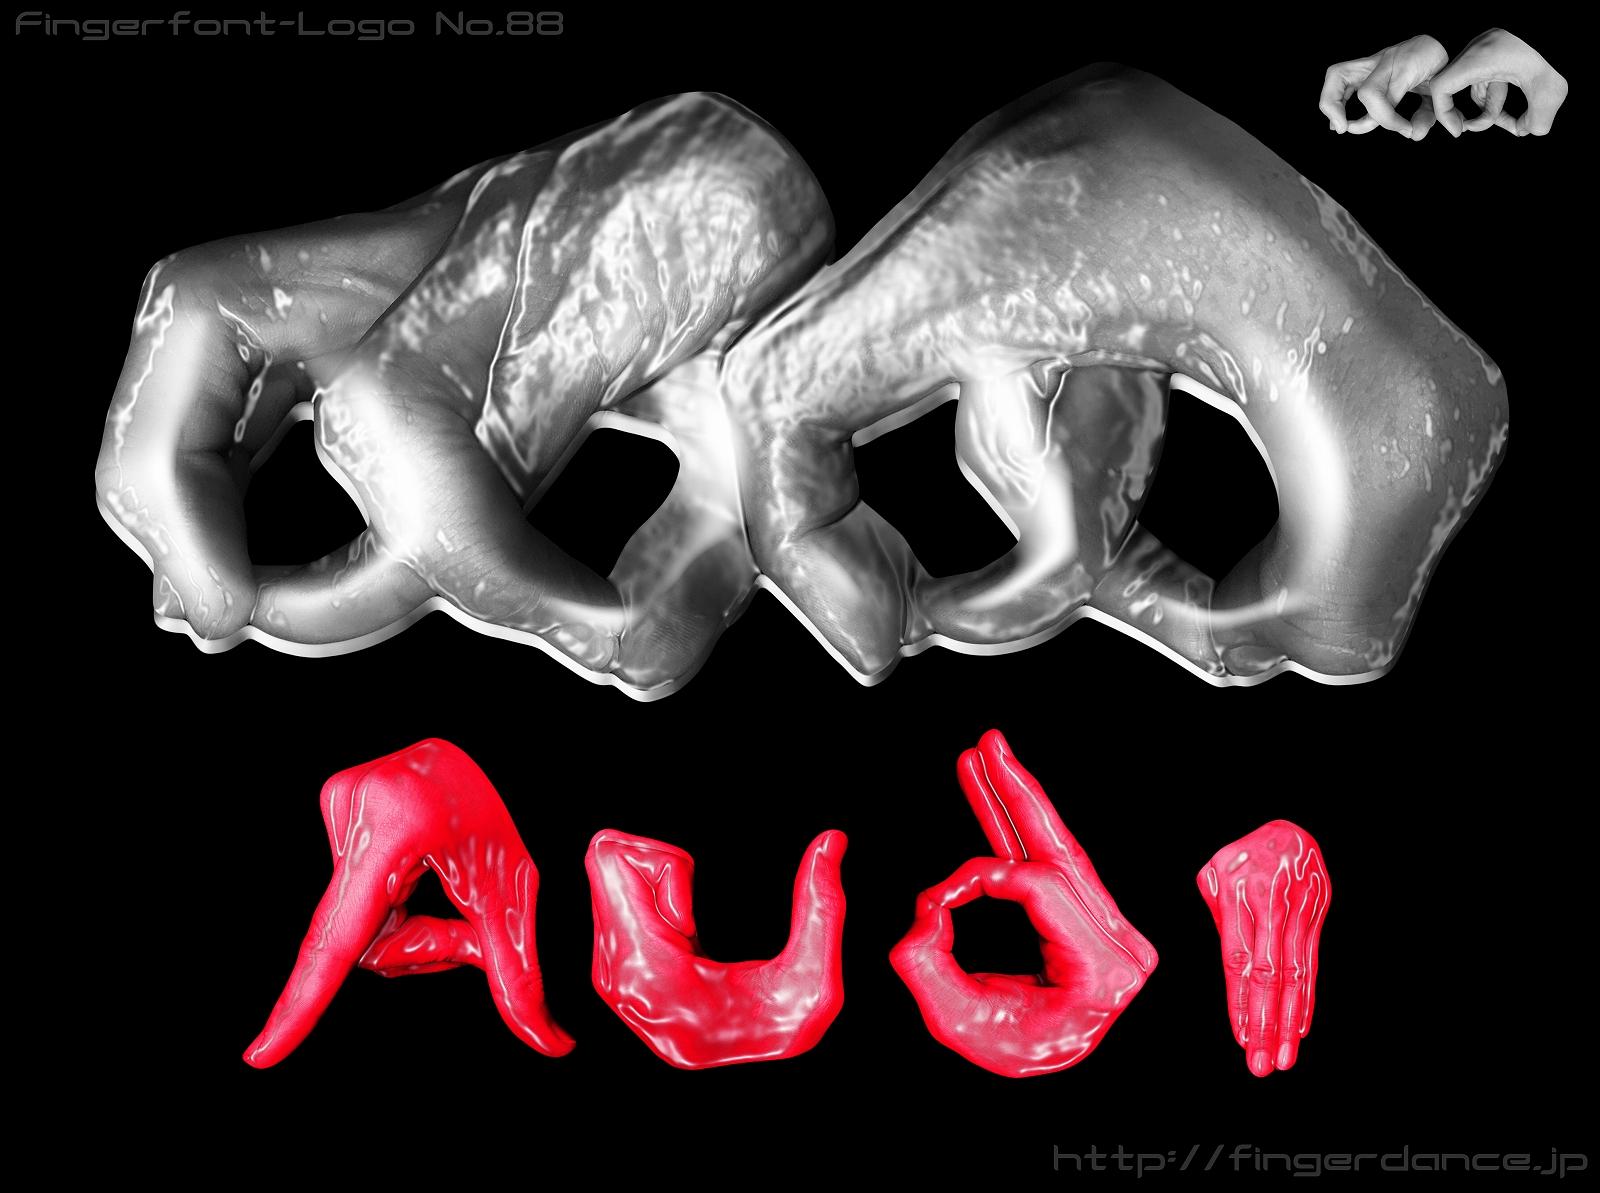 Audi-fingerhttp://fingerdance.jp/L/logohand アウディ・フィンガーロゴハンド手指